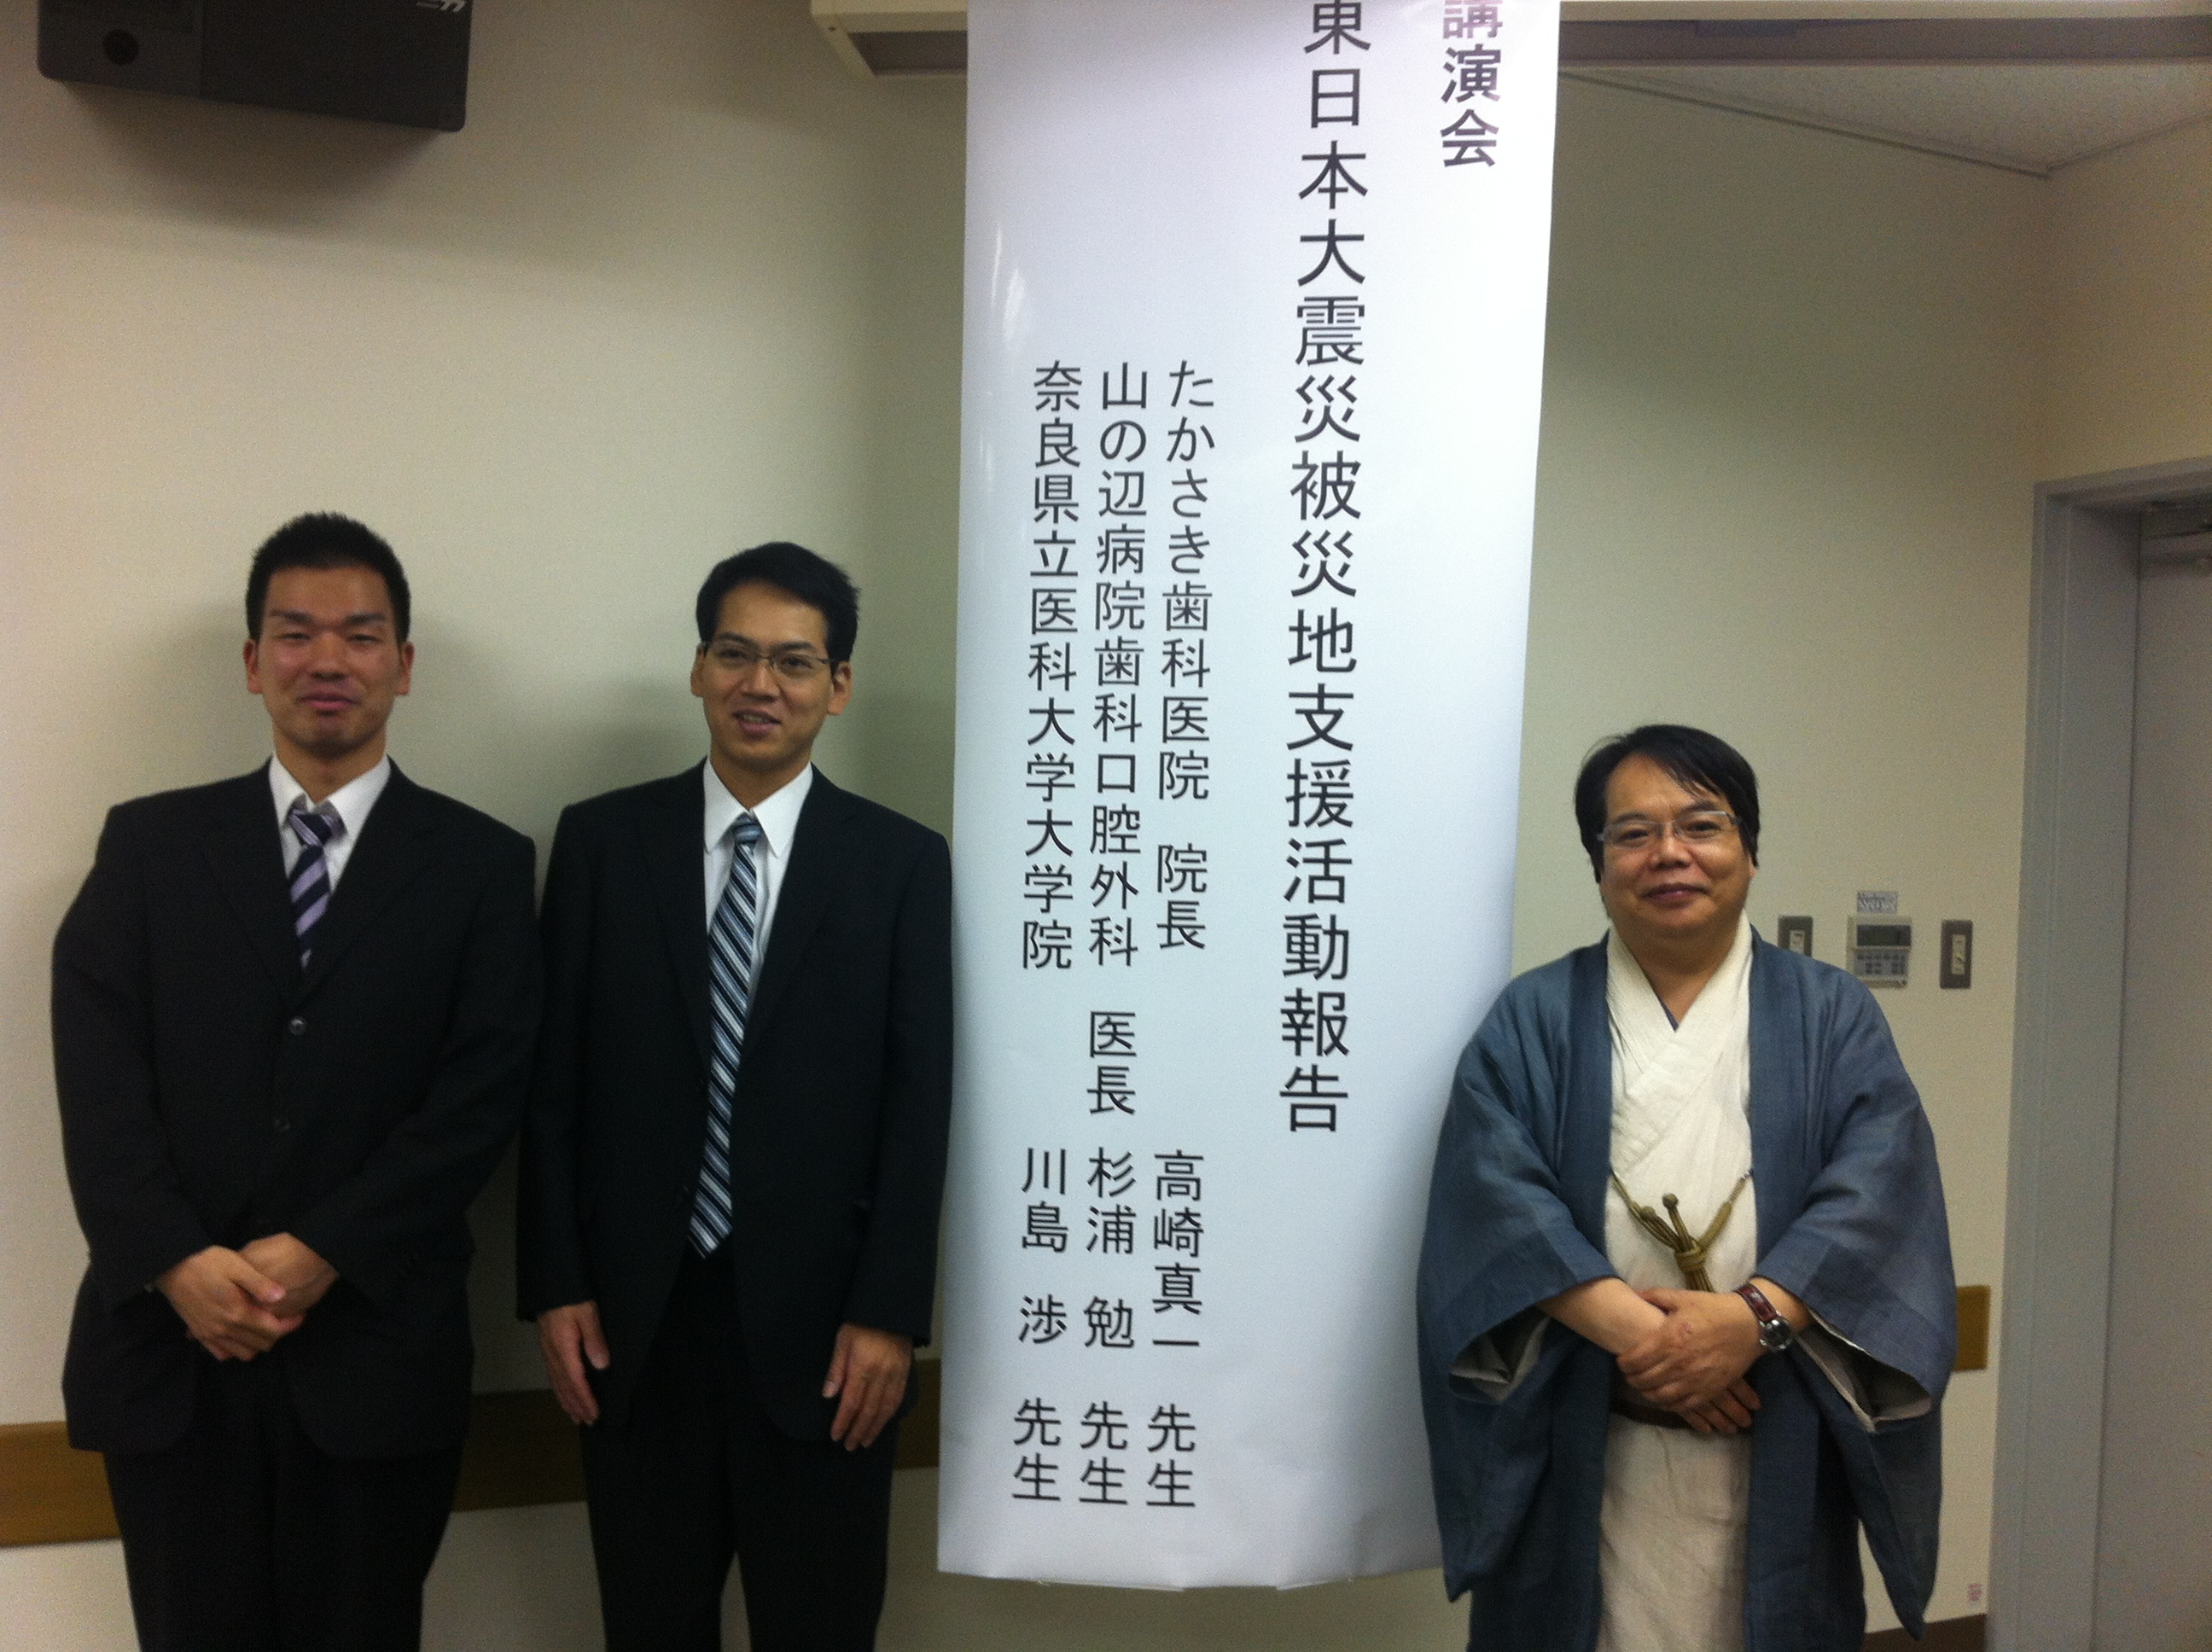 IMG 13821 - 東日本大震災被災地支援活動を報告しました!!